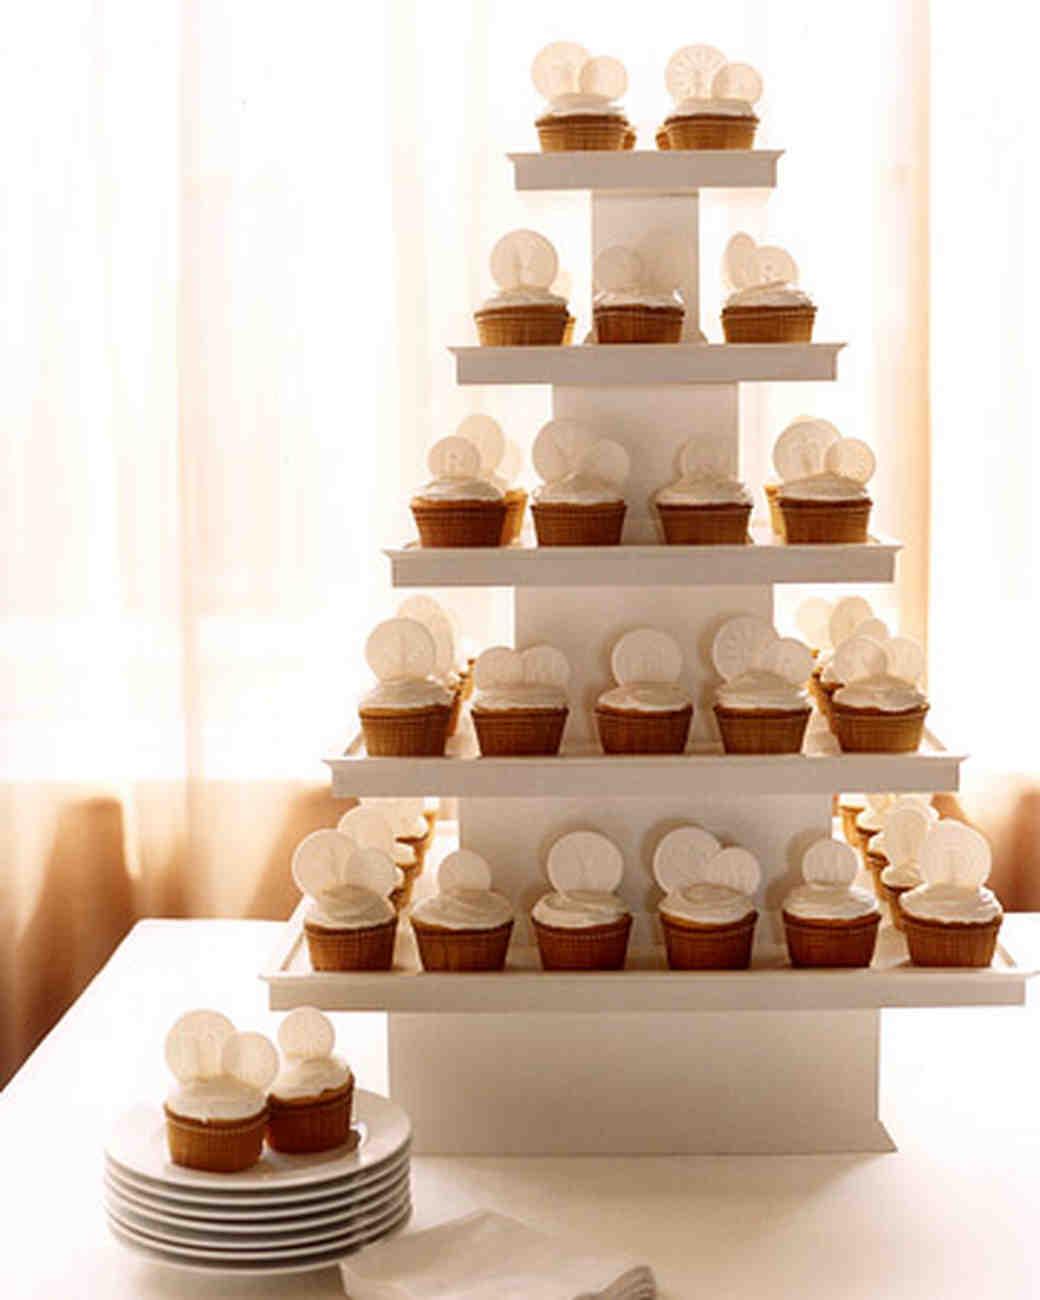 Fullsize Of Cupcake Wedding Cake